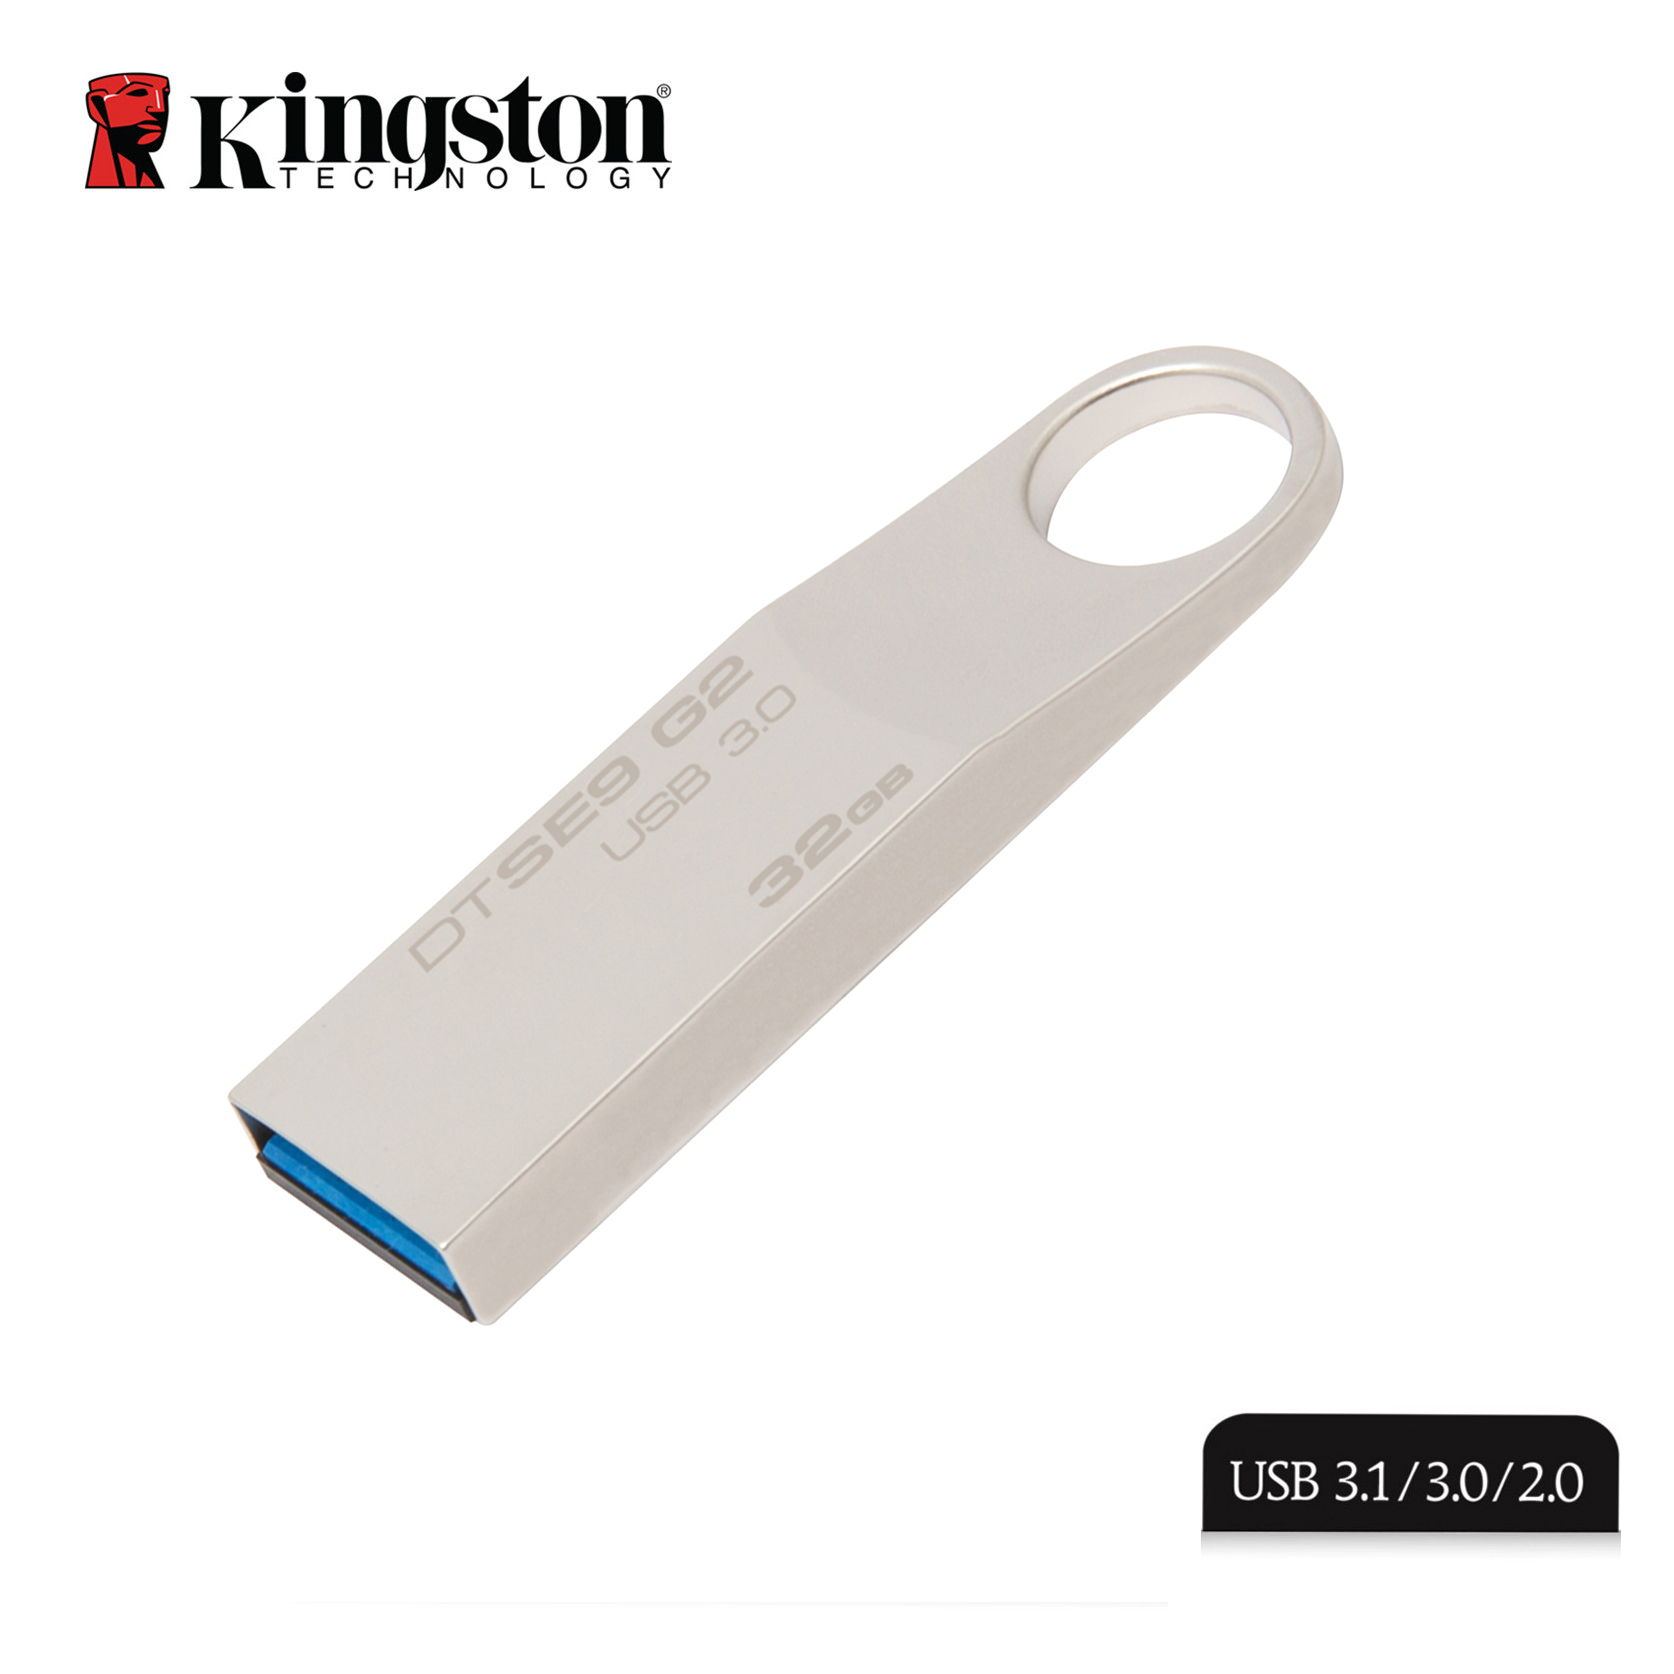 Kingston pendrive memoria usb 32 gb usb-flash-laufwerk otg caneta usb memory stick micro u disk